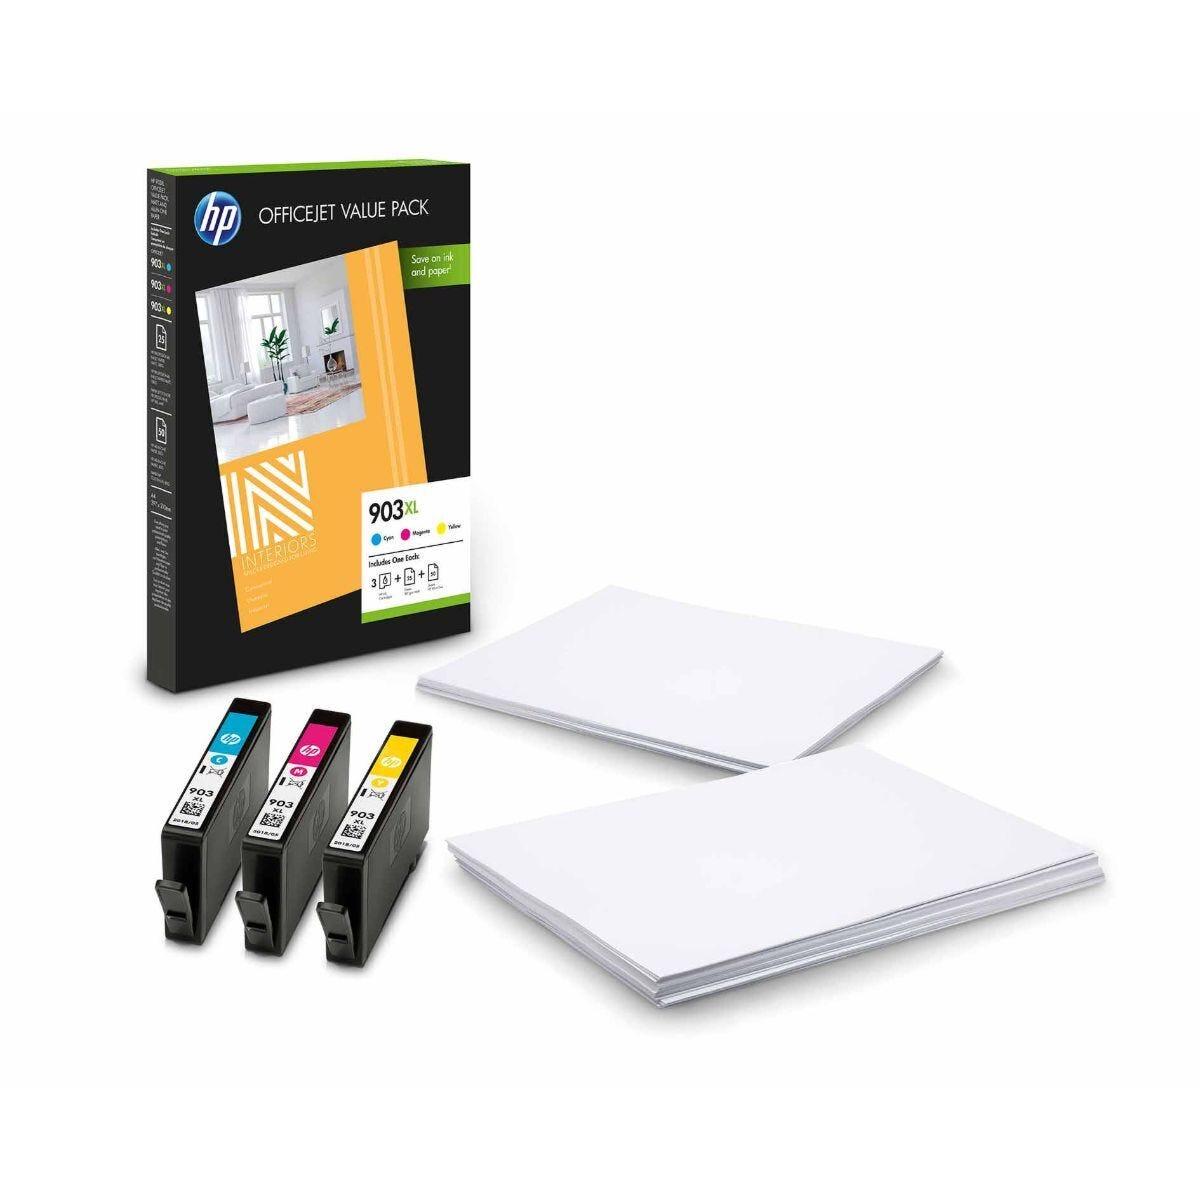 HP 903XL Office Value Pack Original Ink Cartridges